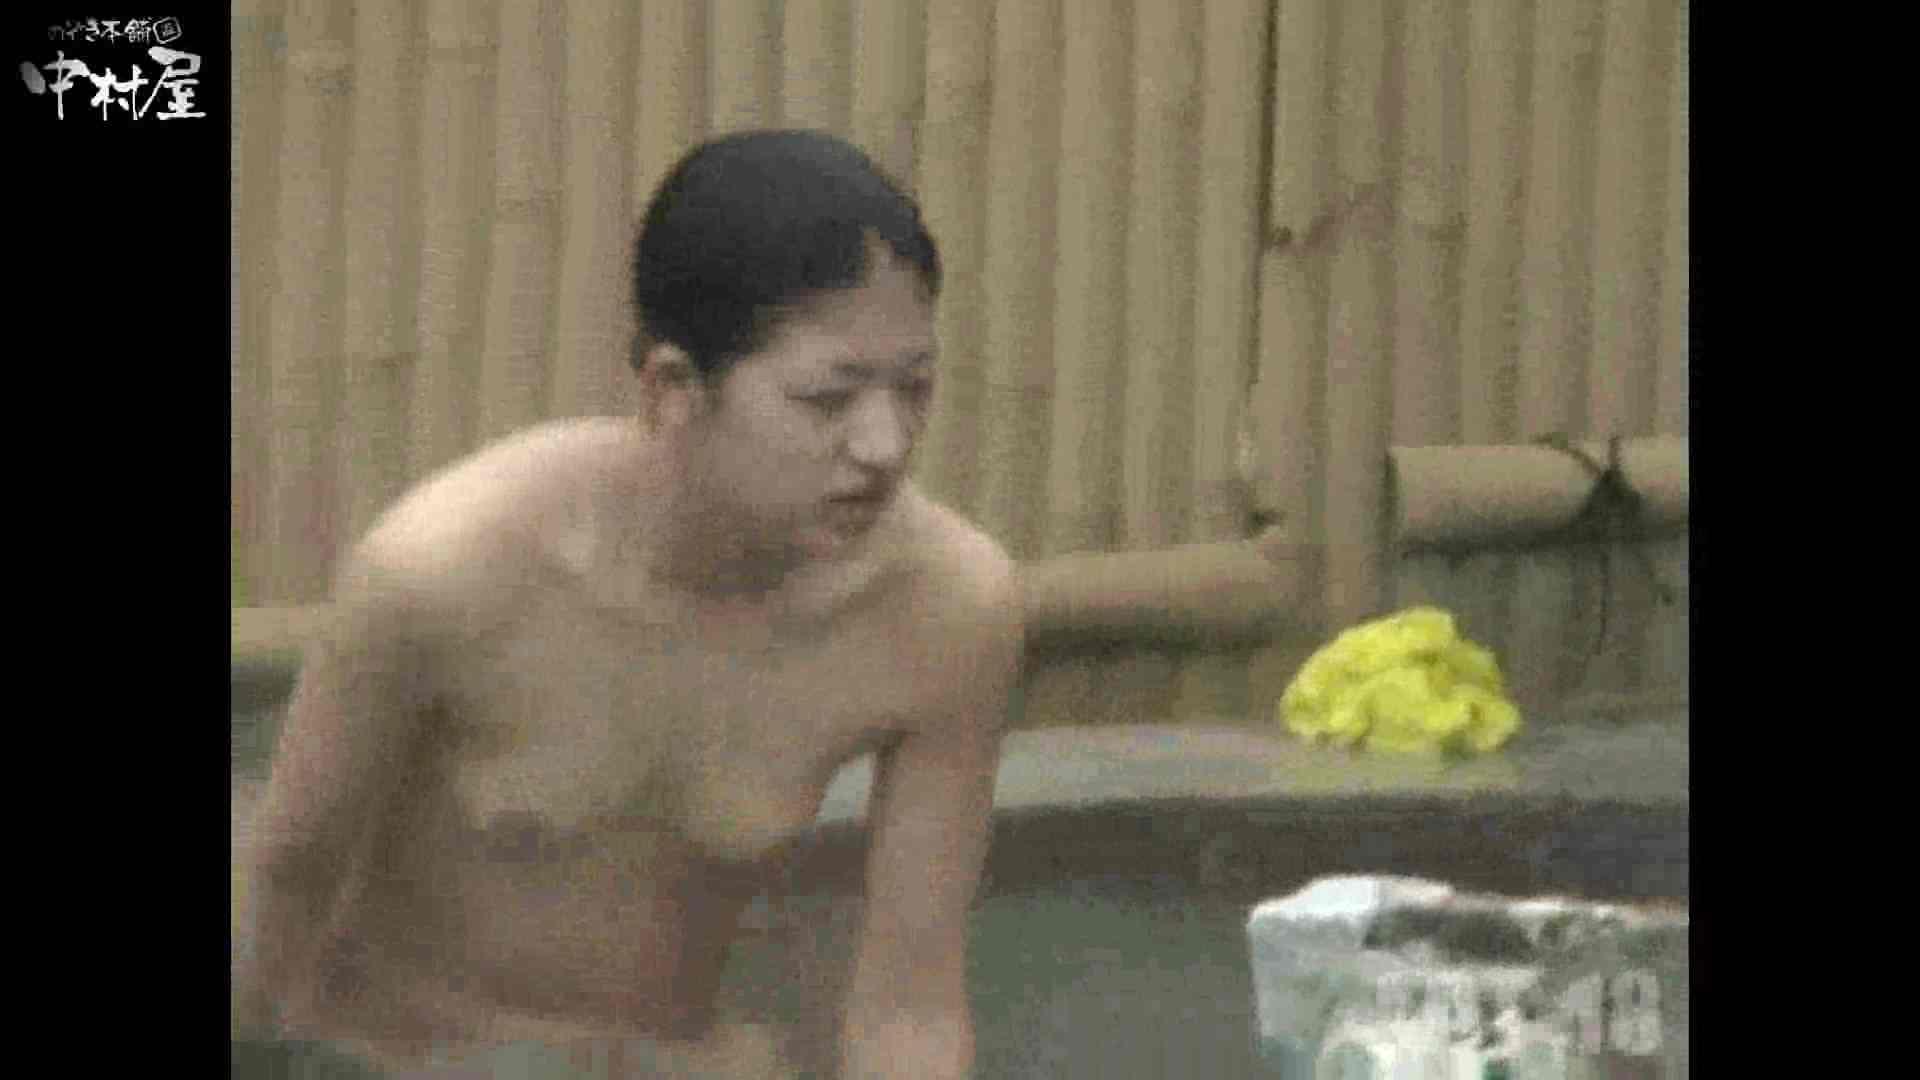 Aquaな露天風呂Vol.882潜入盗撮露天風呂十八判湯 其の五 潜入 SEX無修正画像 77連発 46